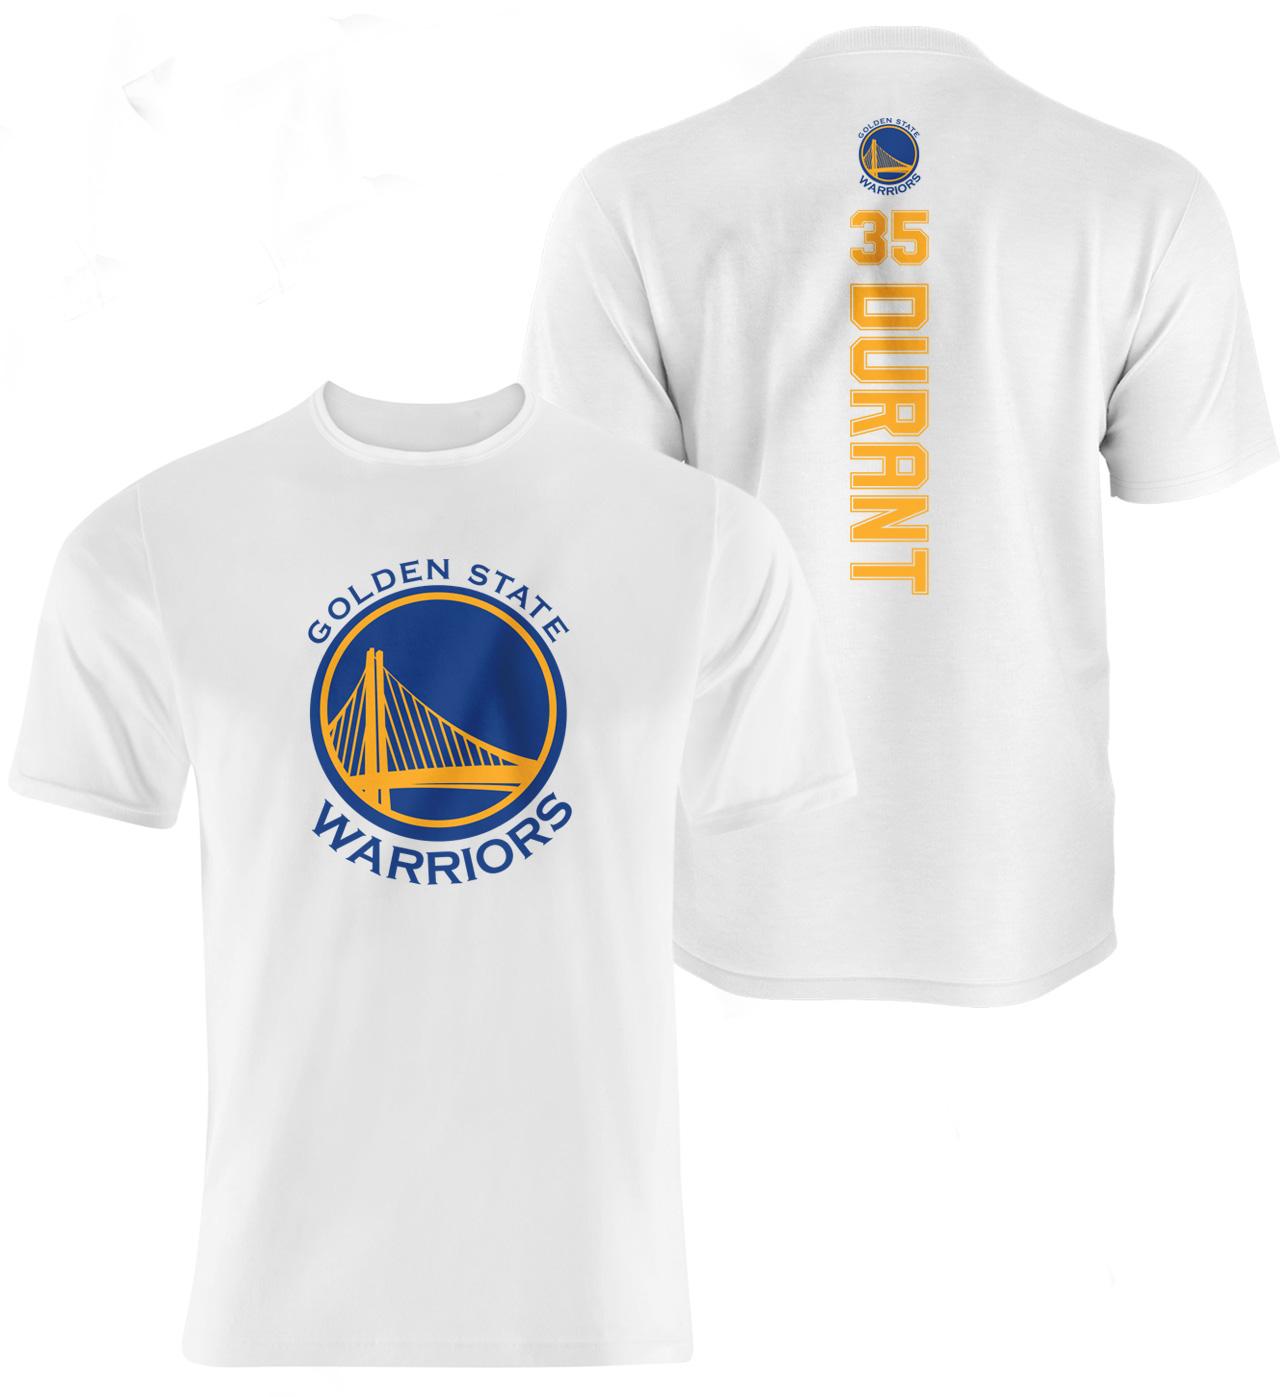 Kevin Durant Vertical Tshirt (TSH-WHT-NP-95-PLYR-GSW-DURANT.VER.2)